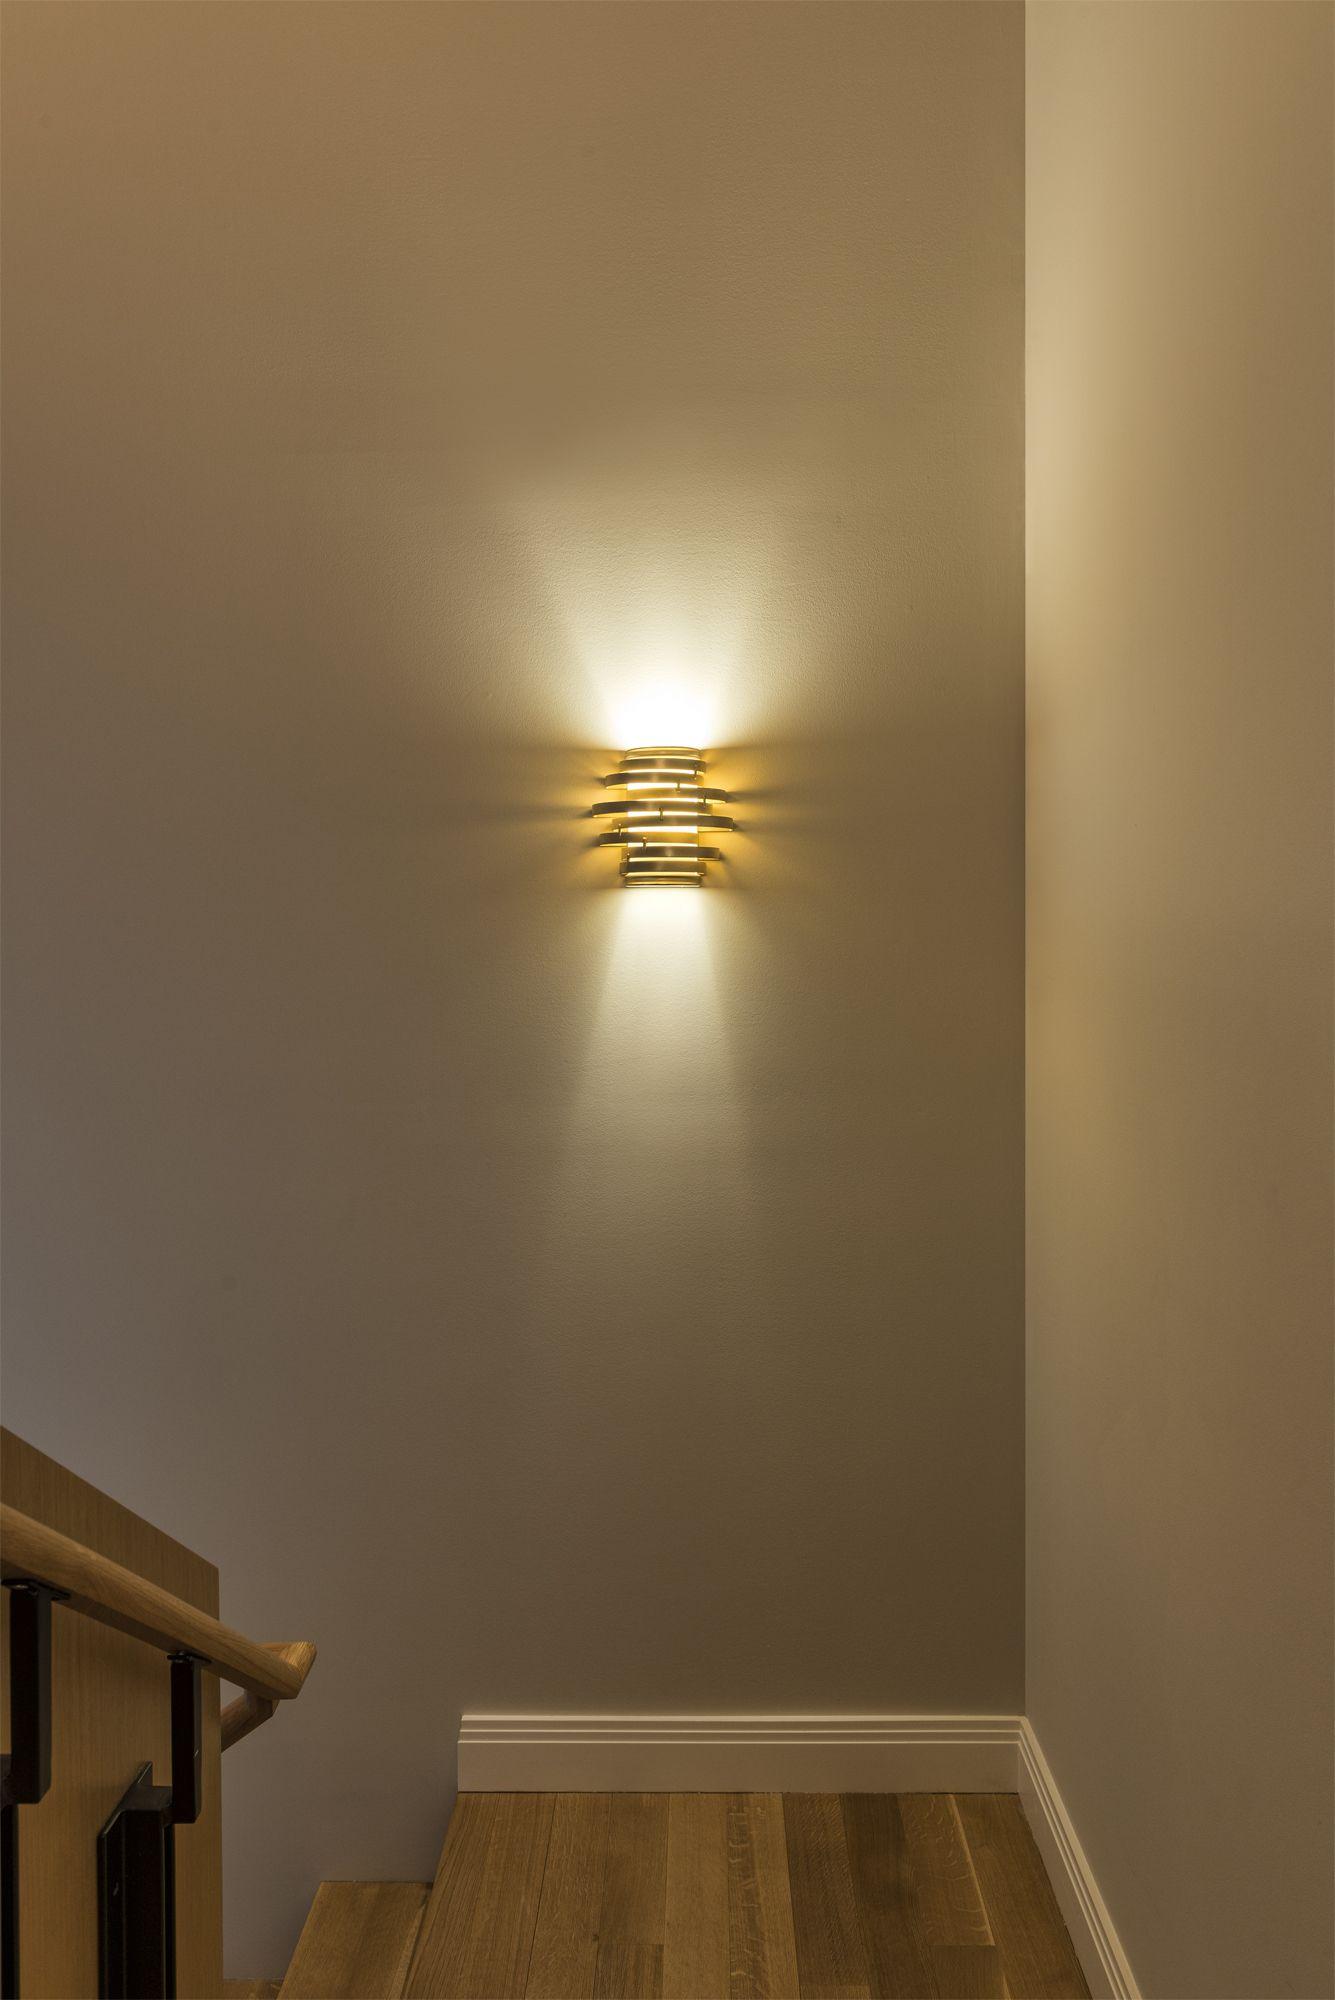 Pin On Small Wall Lights